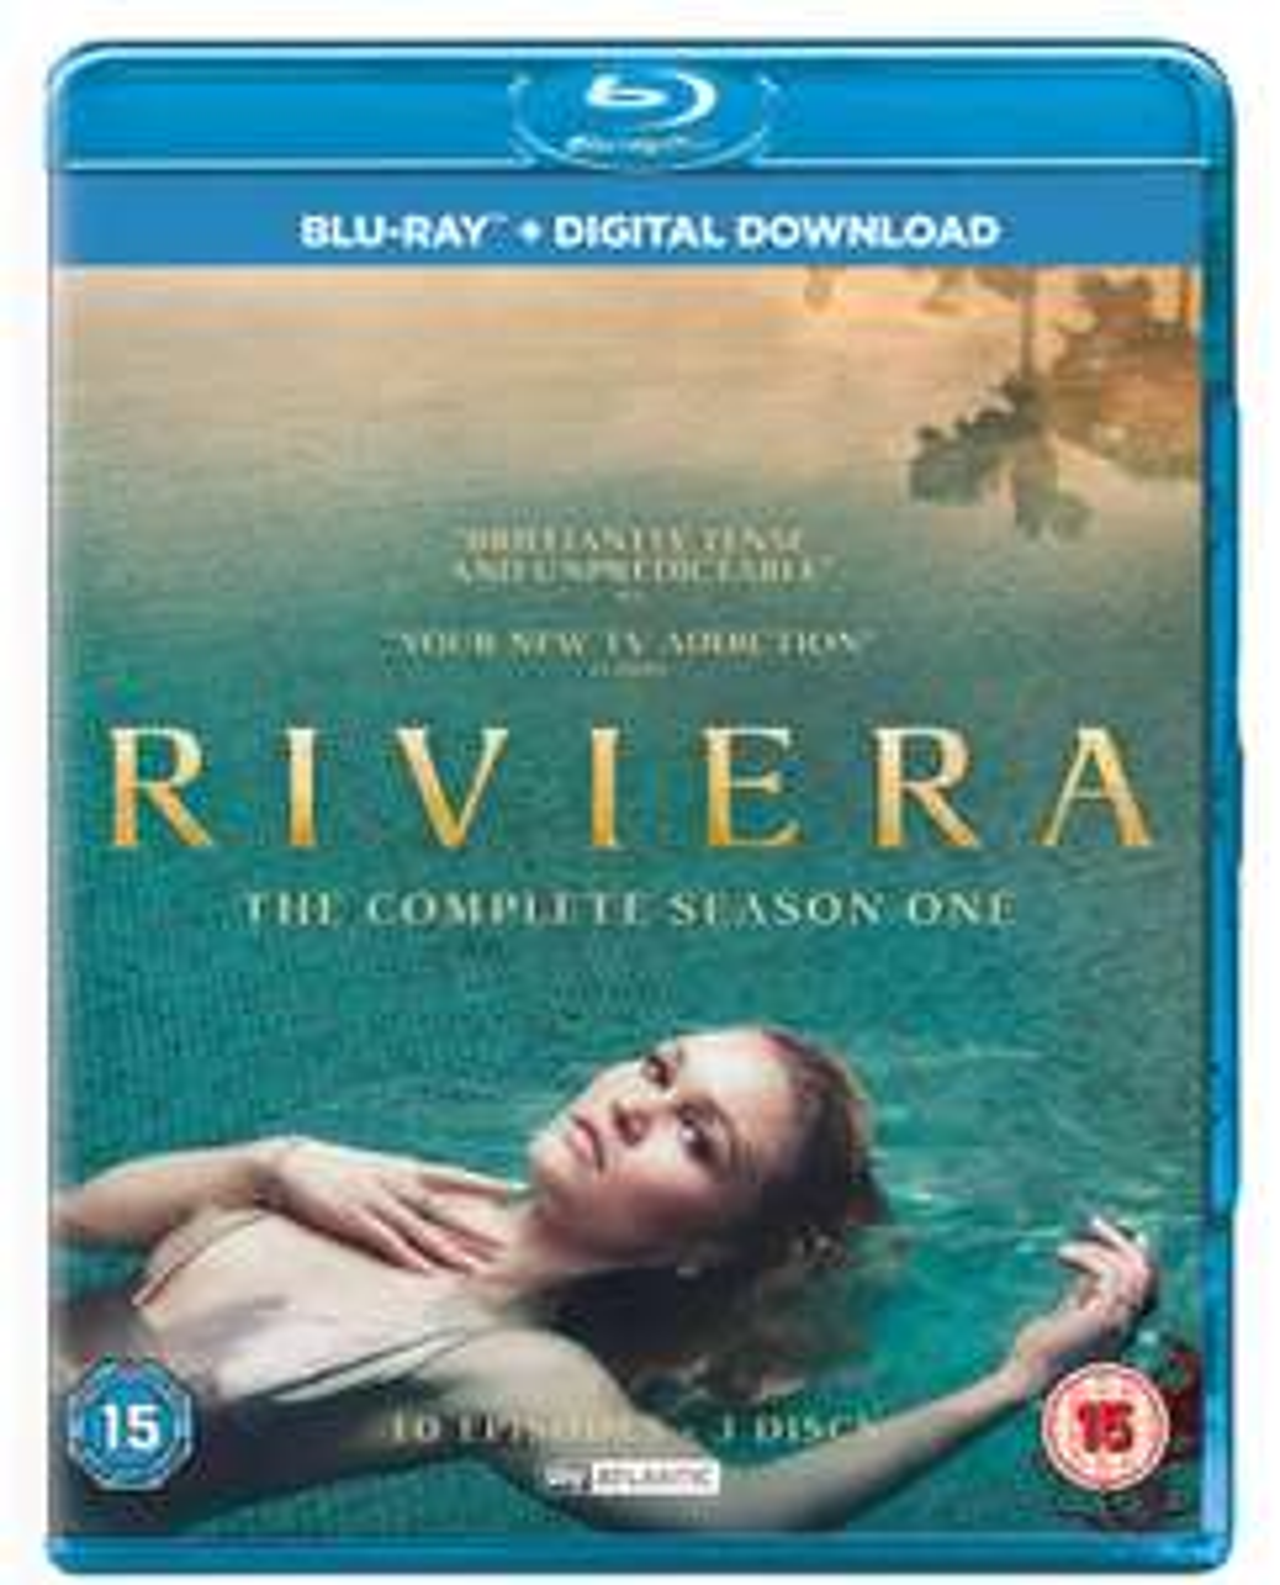 Riviera season 1 blu ray - £3.99 @ HMV + Free click and collect